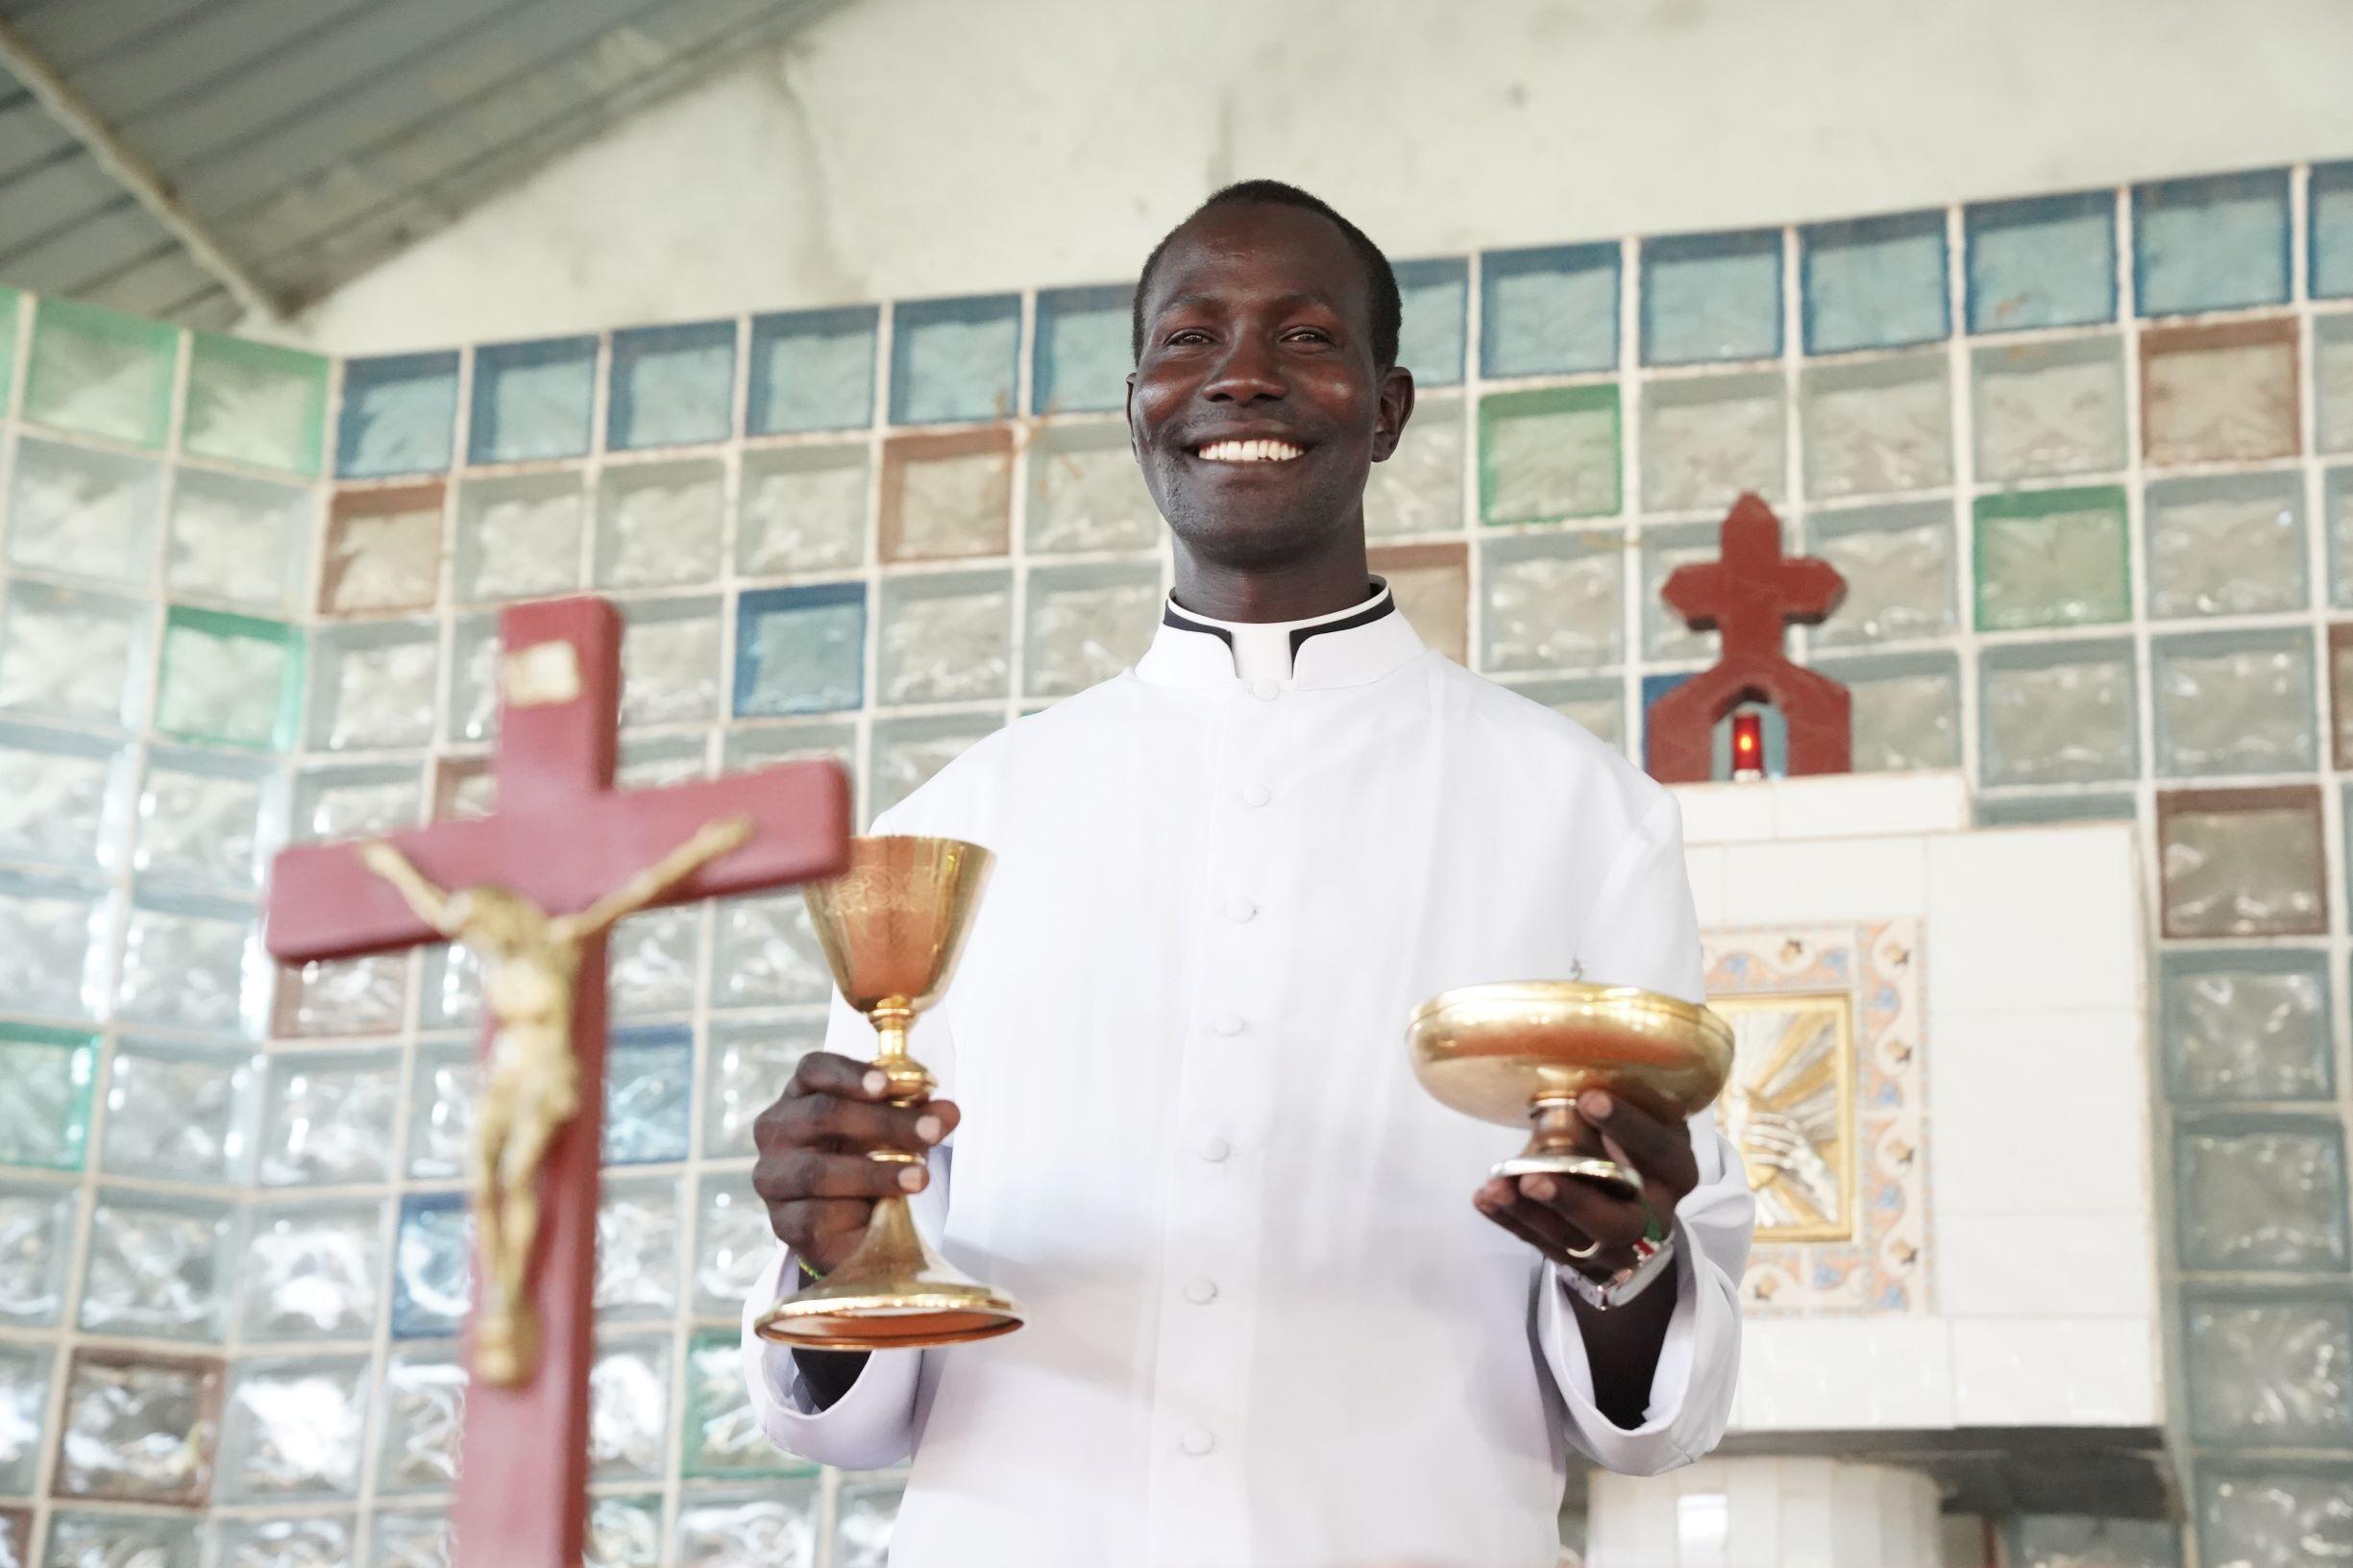 Father Imo Bassols